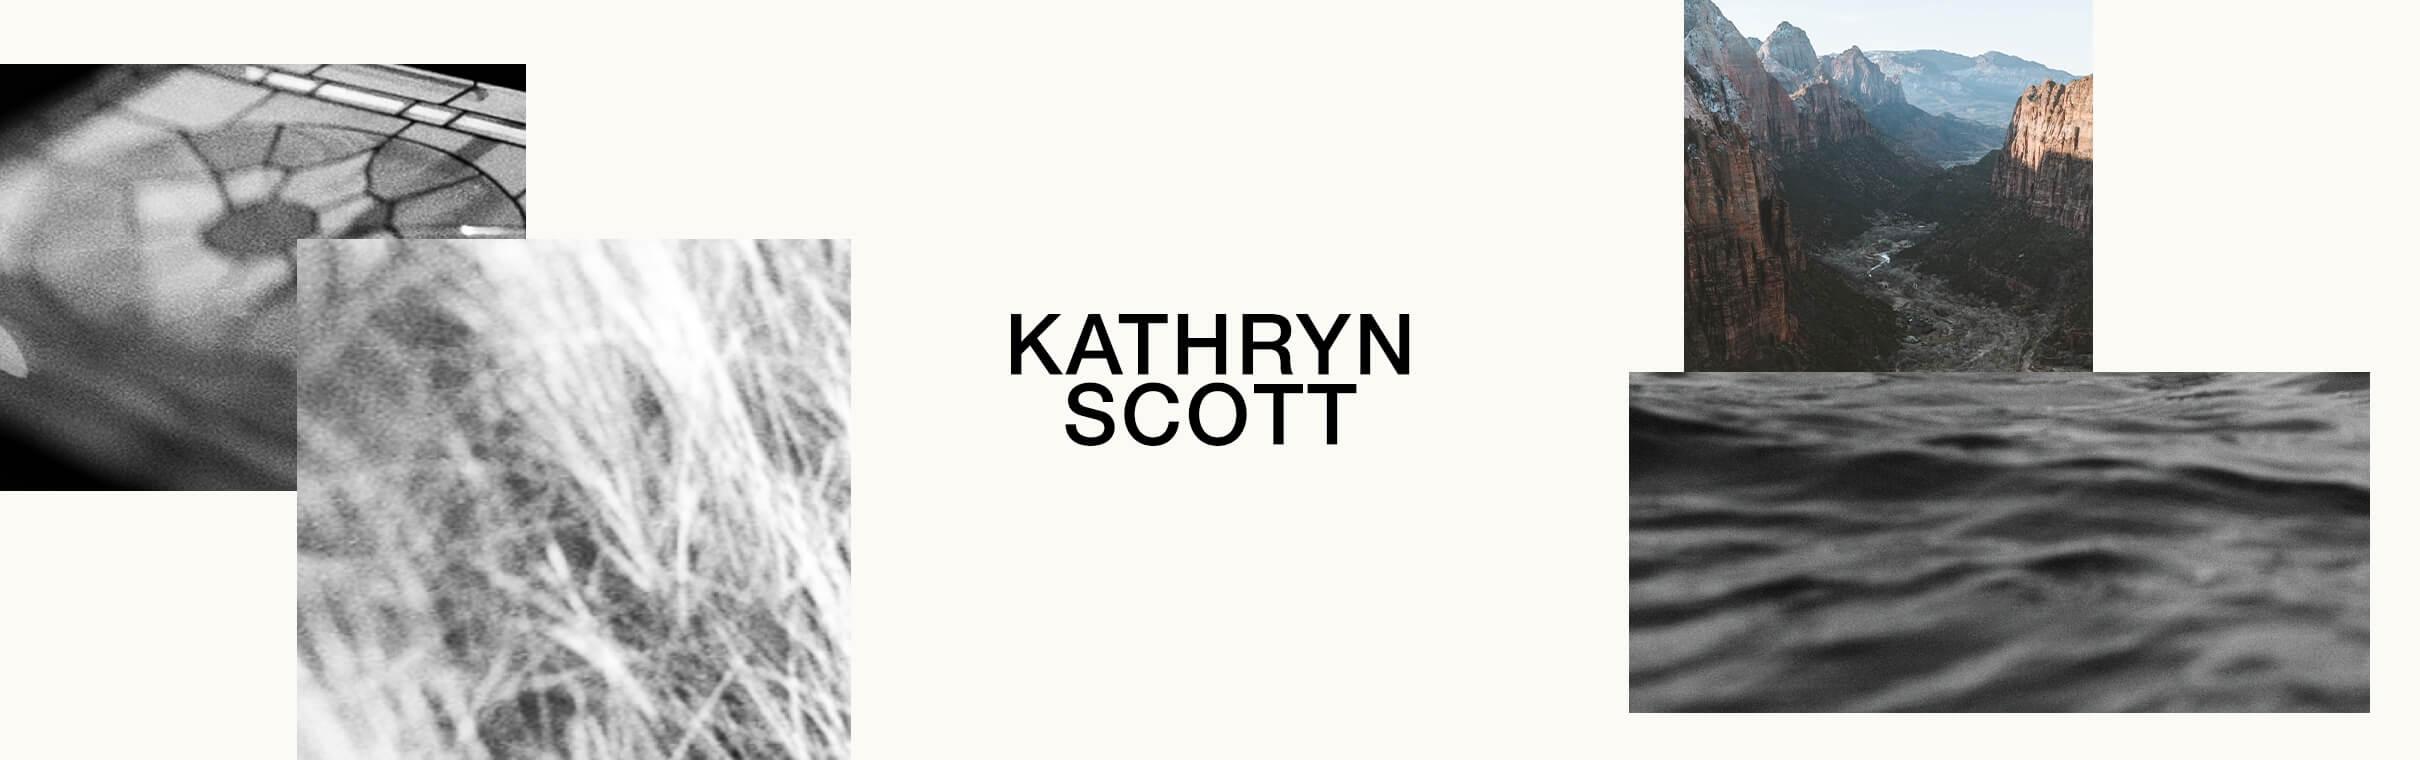 Kathryn Scott